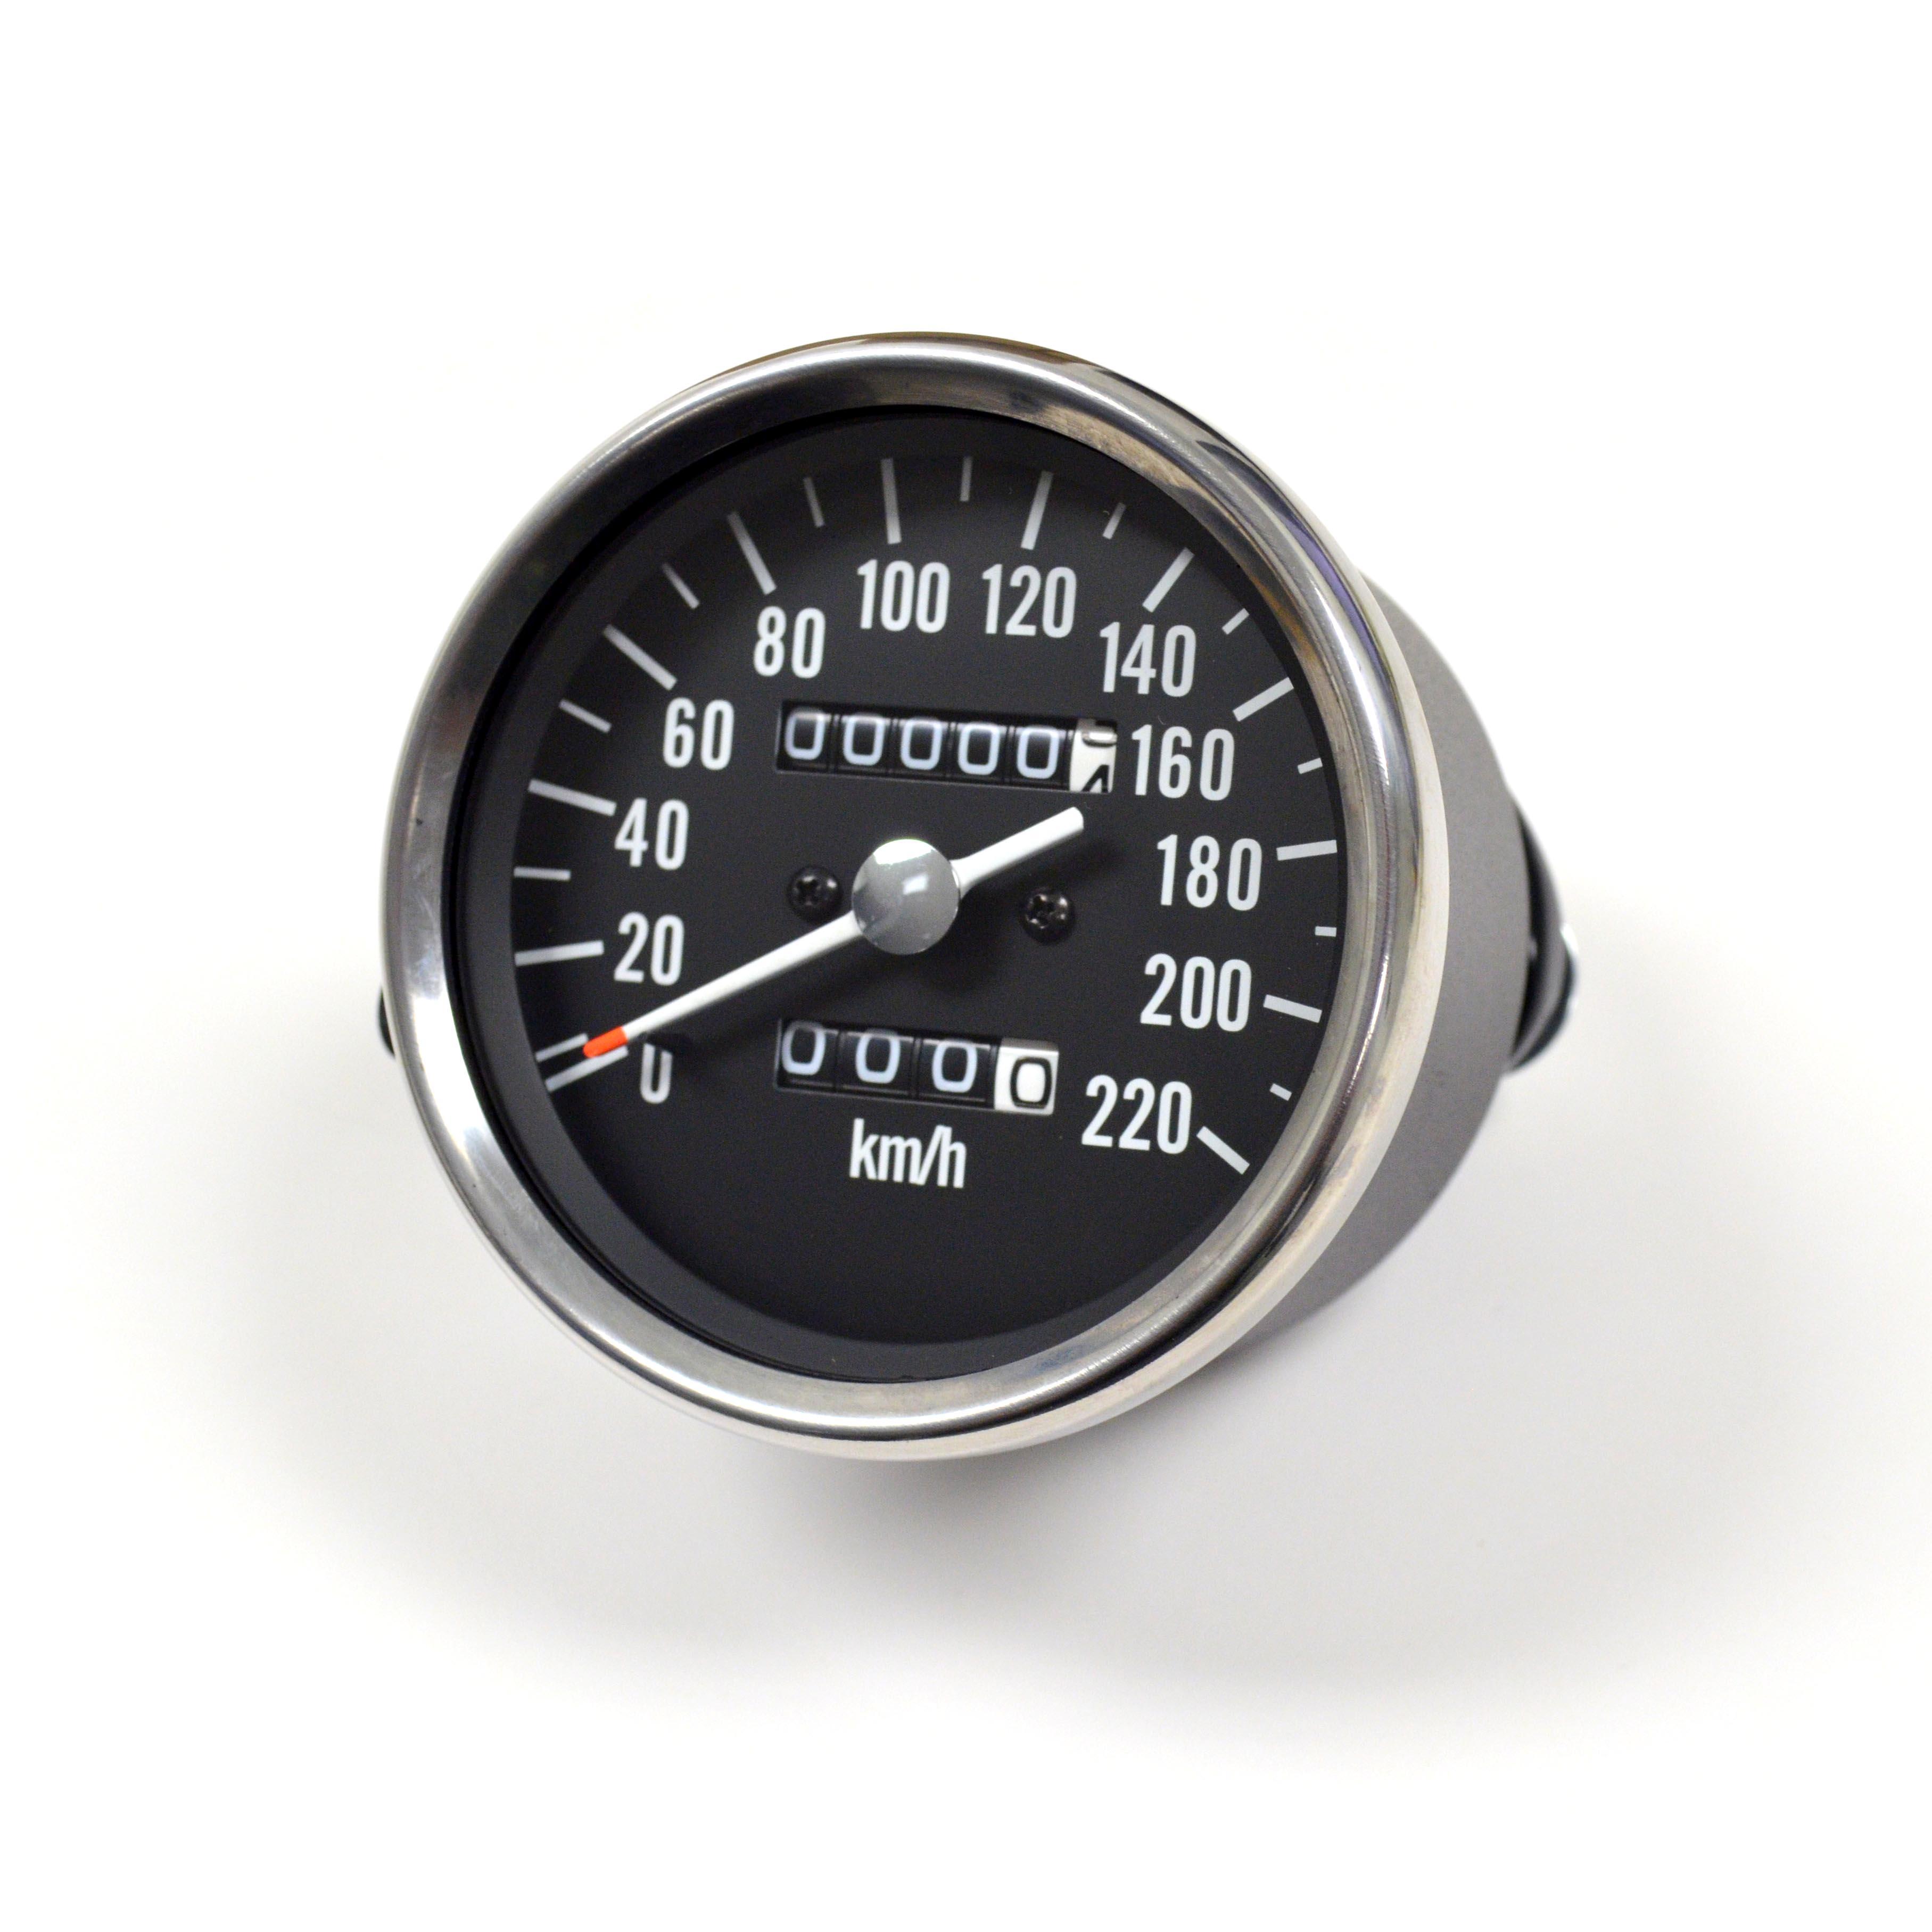 kawasaki h1 mach iii replica reproduction speedo kph speedometer gauge ebay. Black Bedroom Furniture Sets. Home Design Ideas